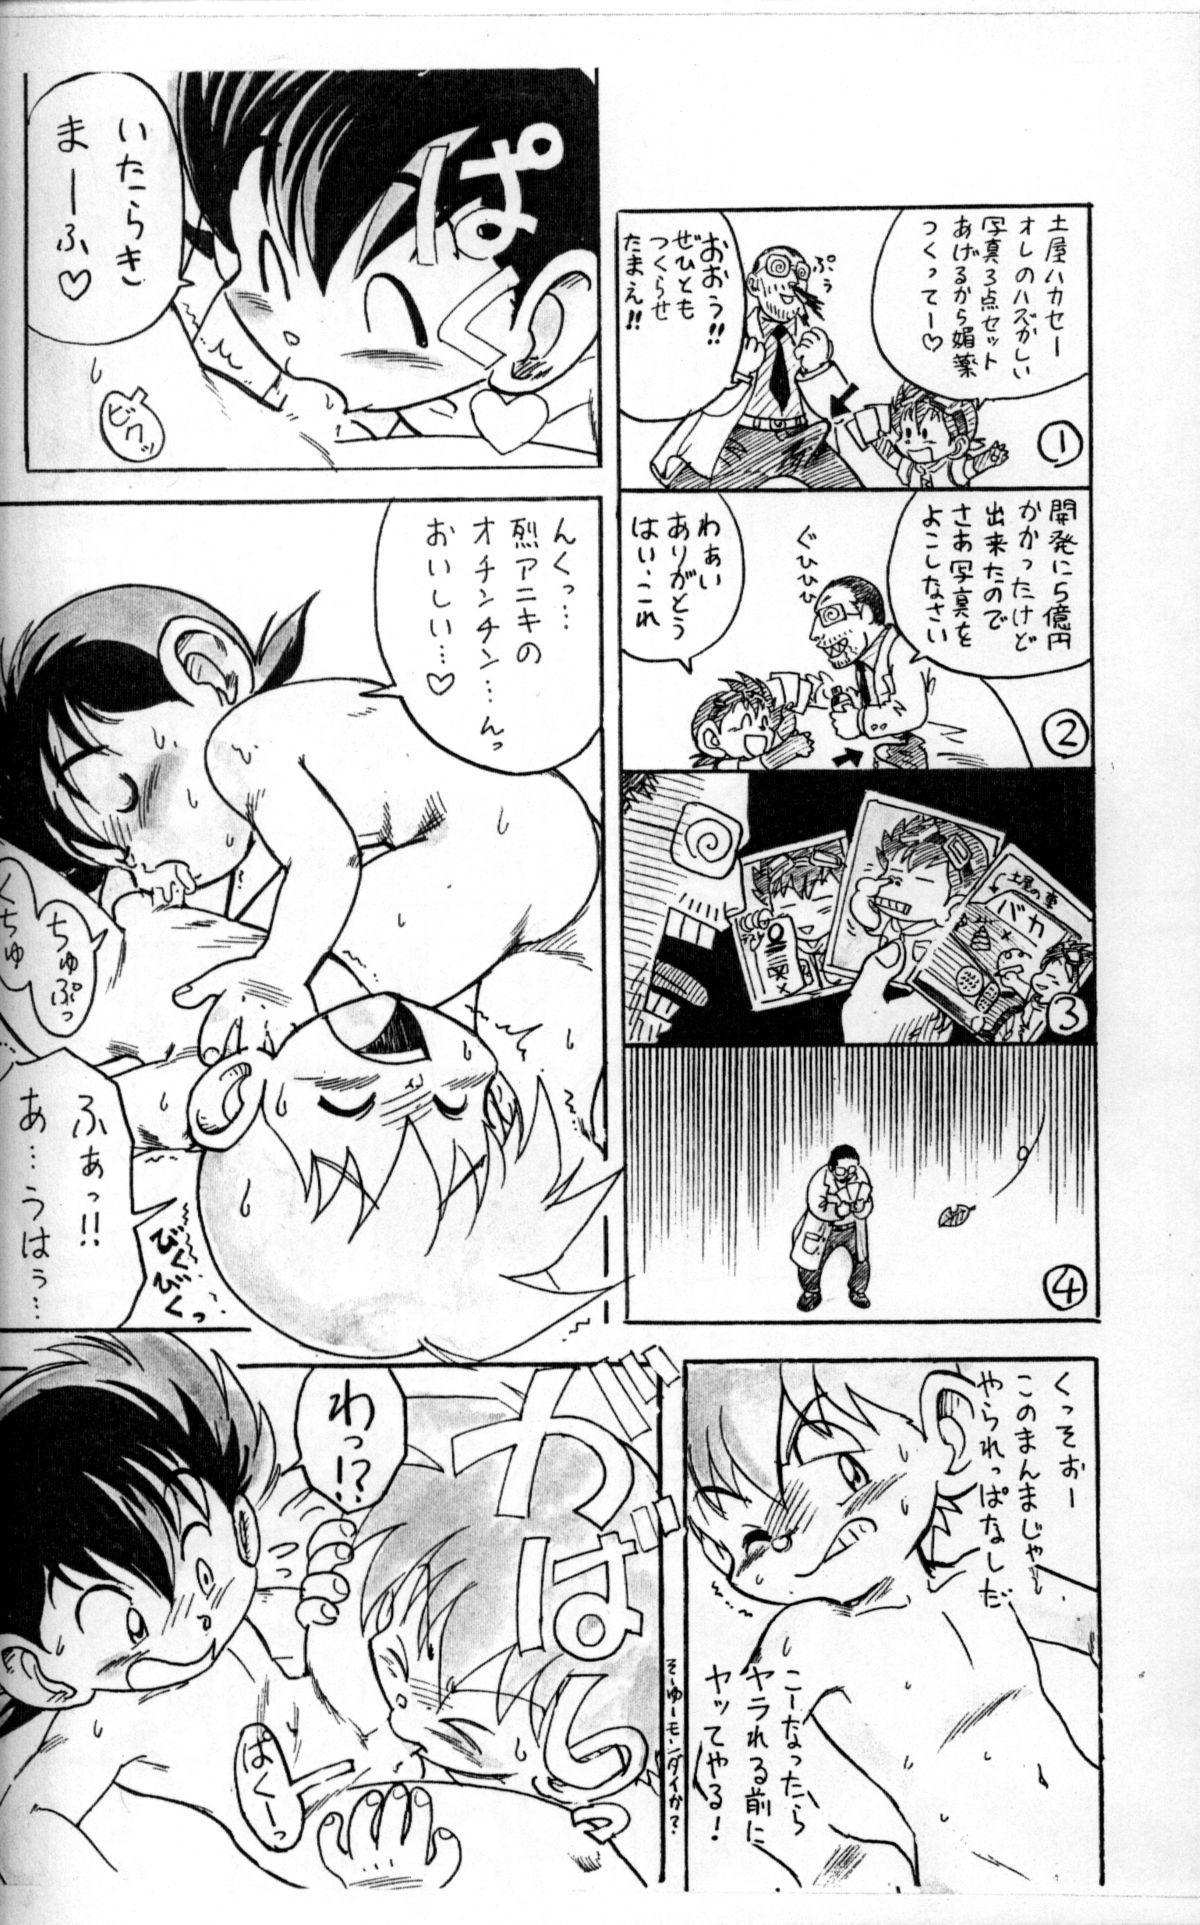 Mitsui Jun - Dreamer's Only - Anime Shota Character Mix 16